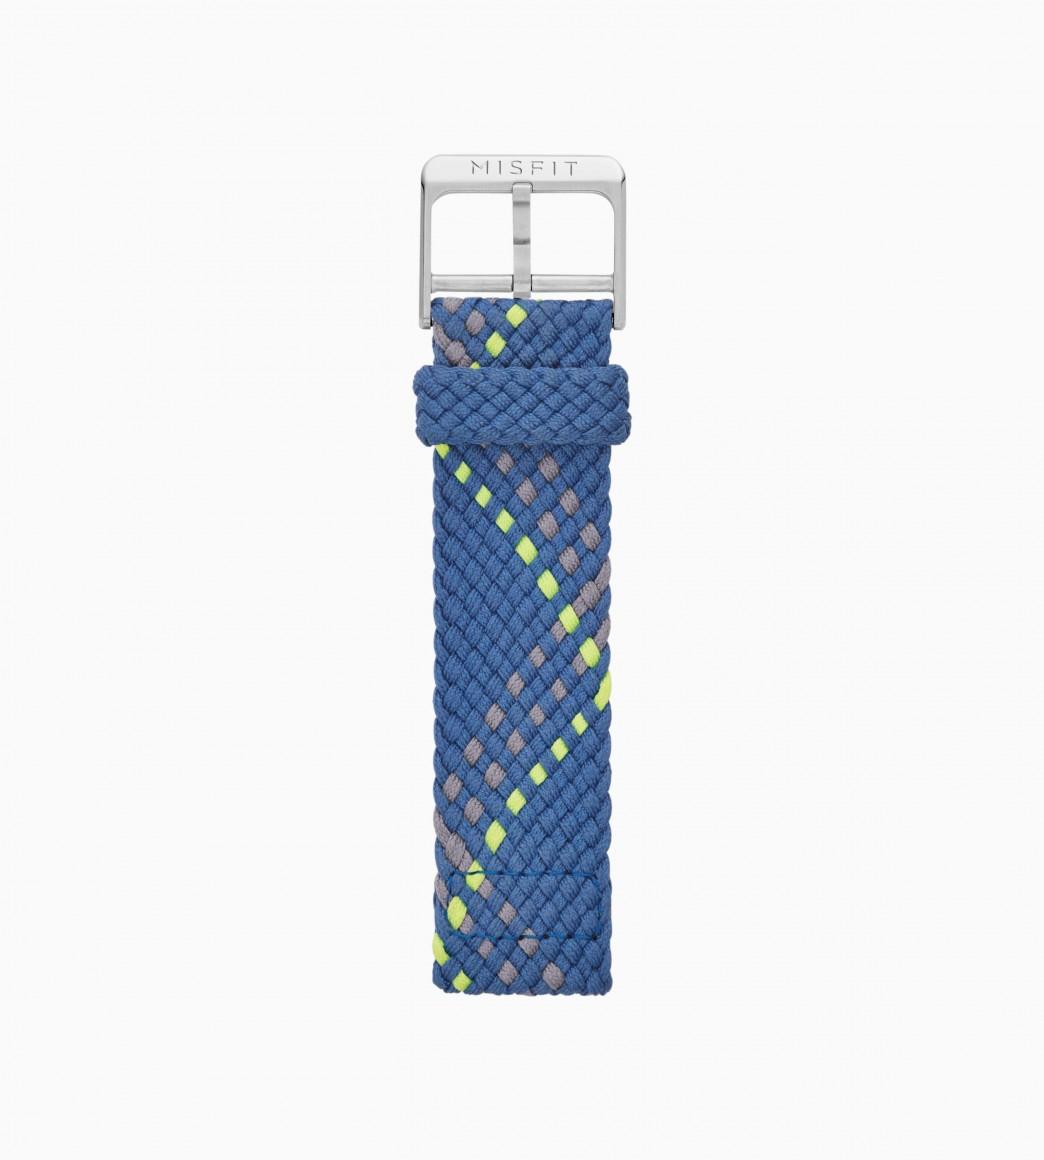 Misfit Smartwatch Accessories